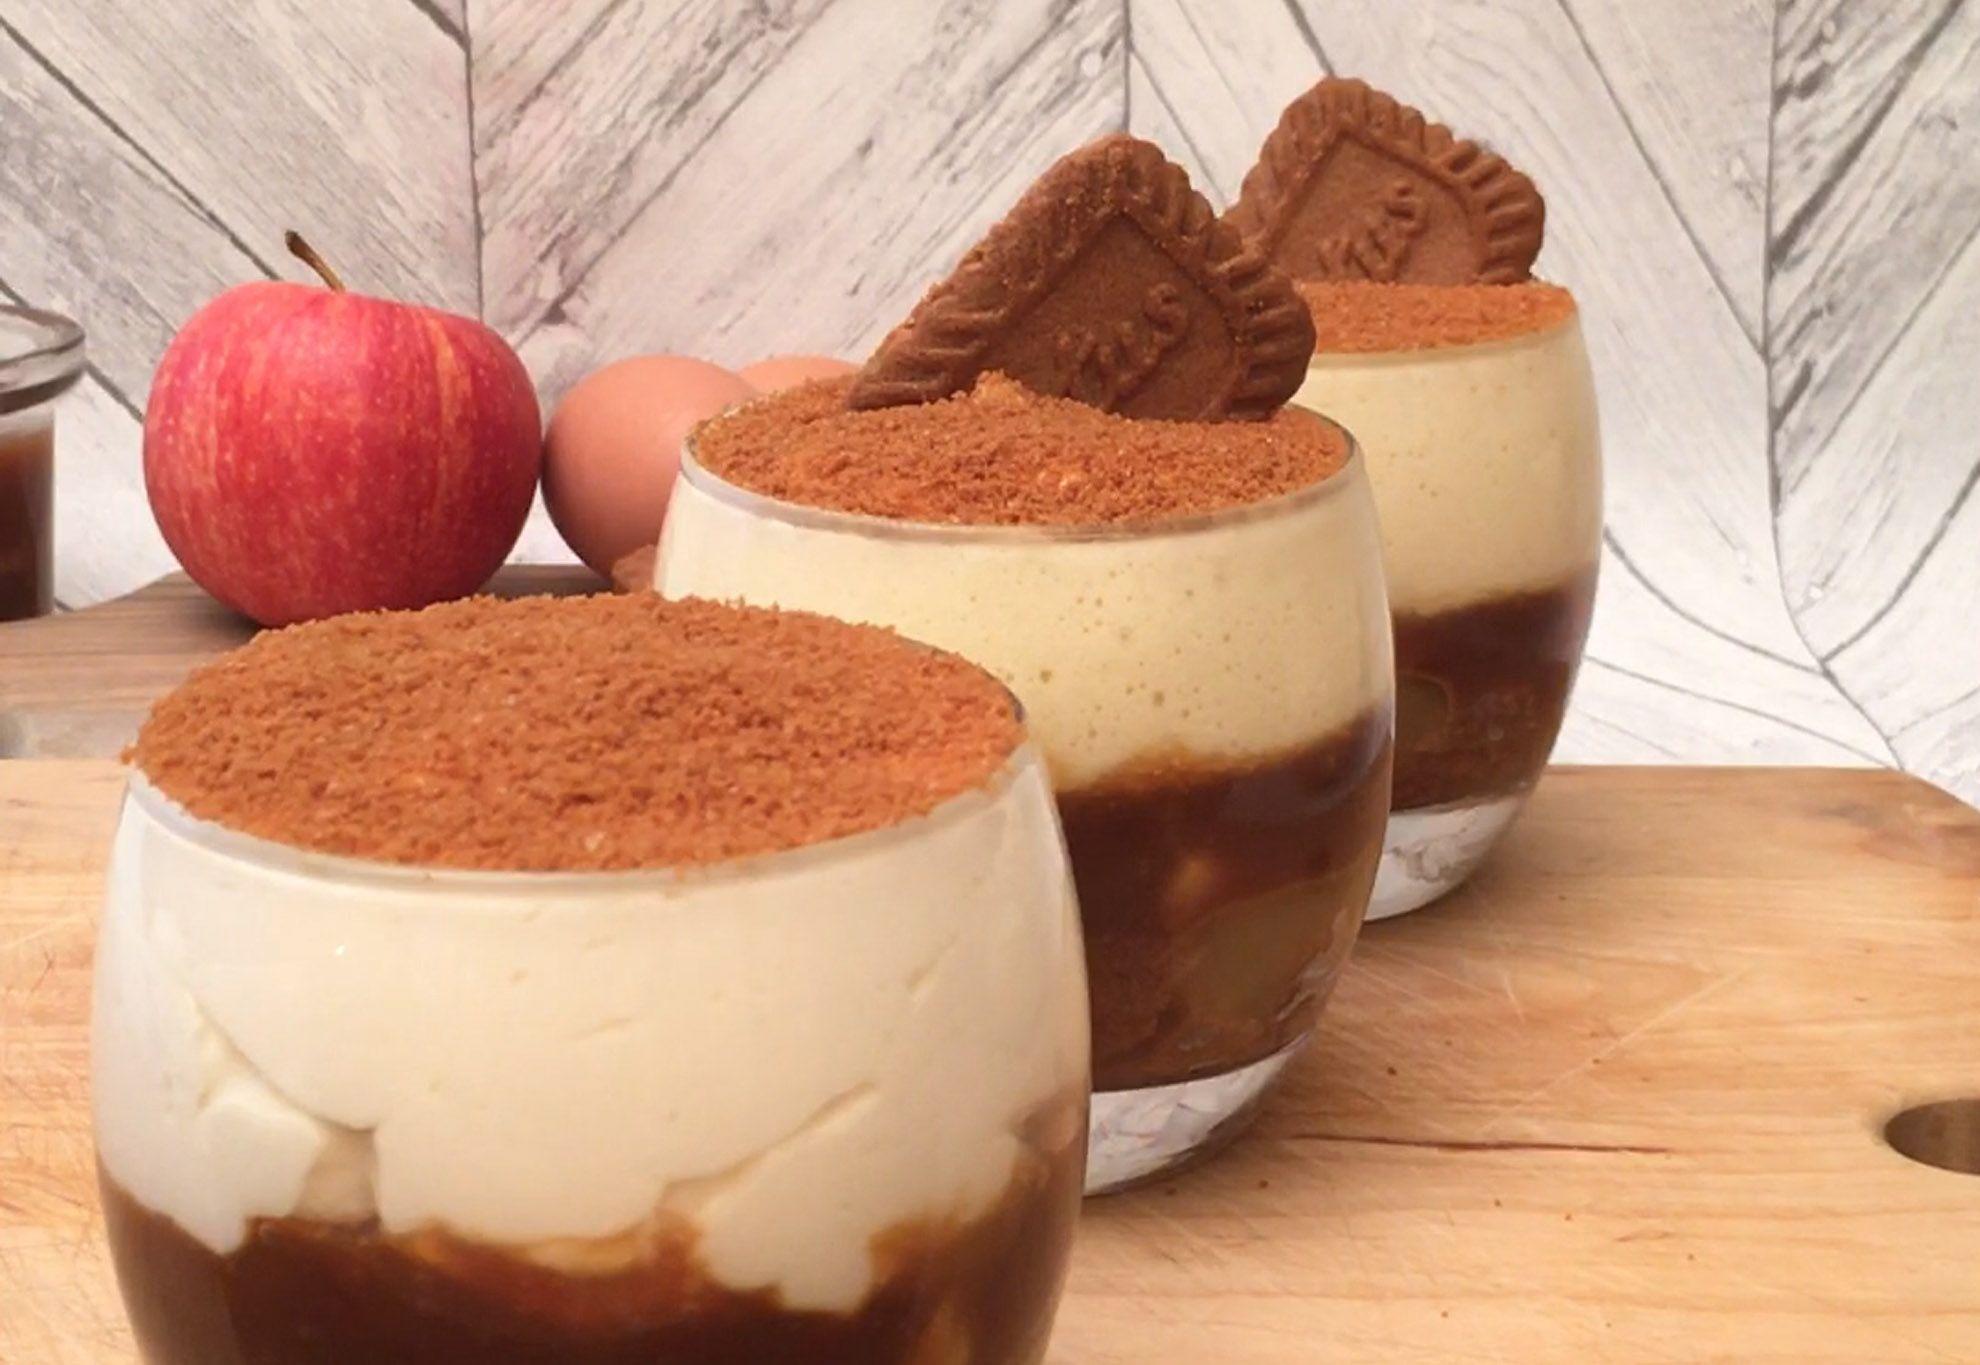 tiramisu pomme caramel beurre sal super rapide faire et d guster ingr dients pour 3. Black Bedroom Furniture Sets. Home Design Ideas